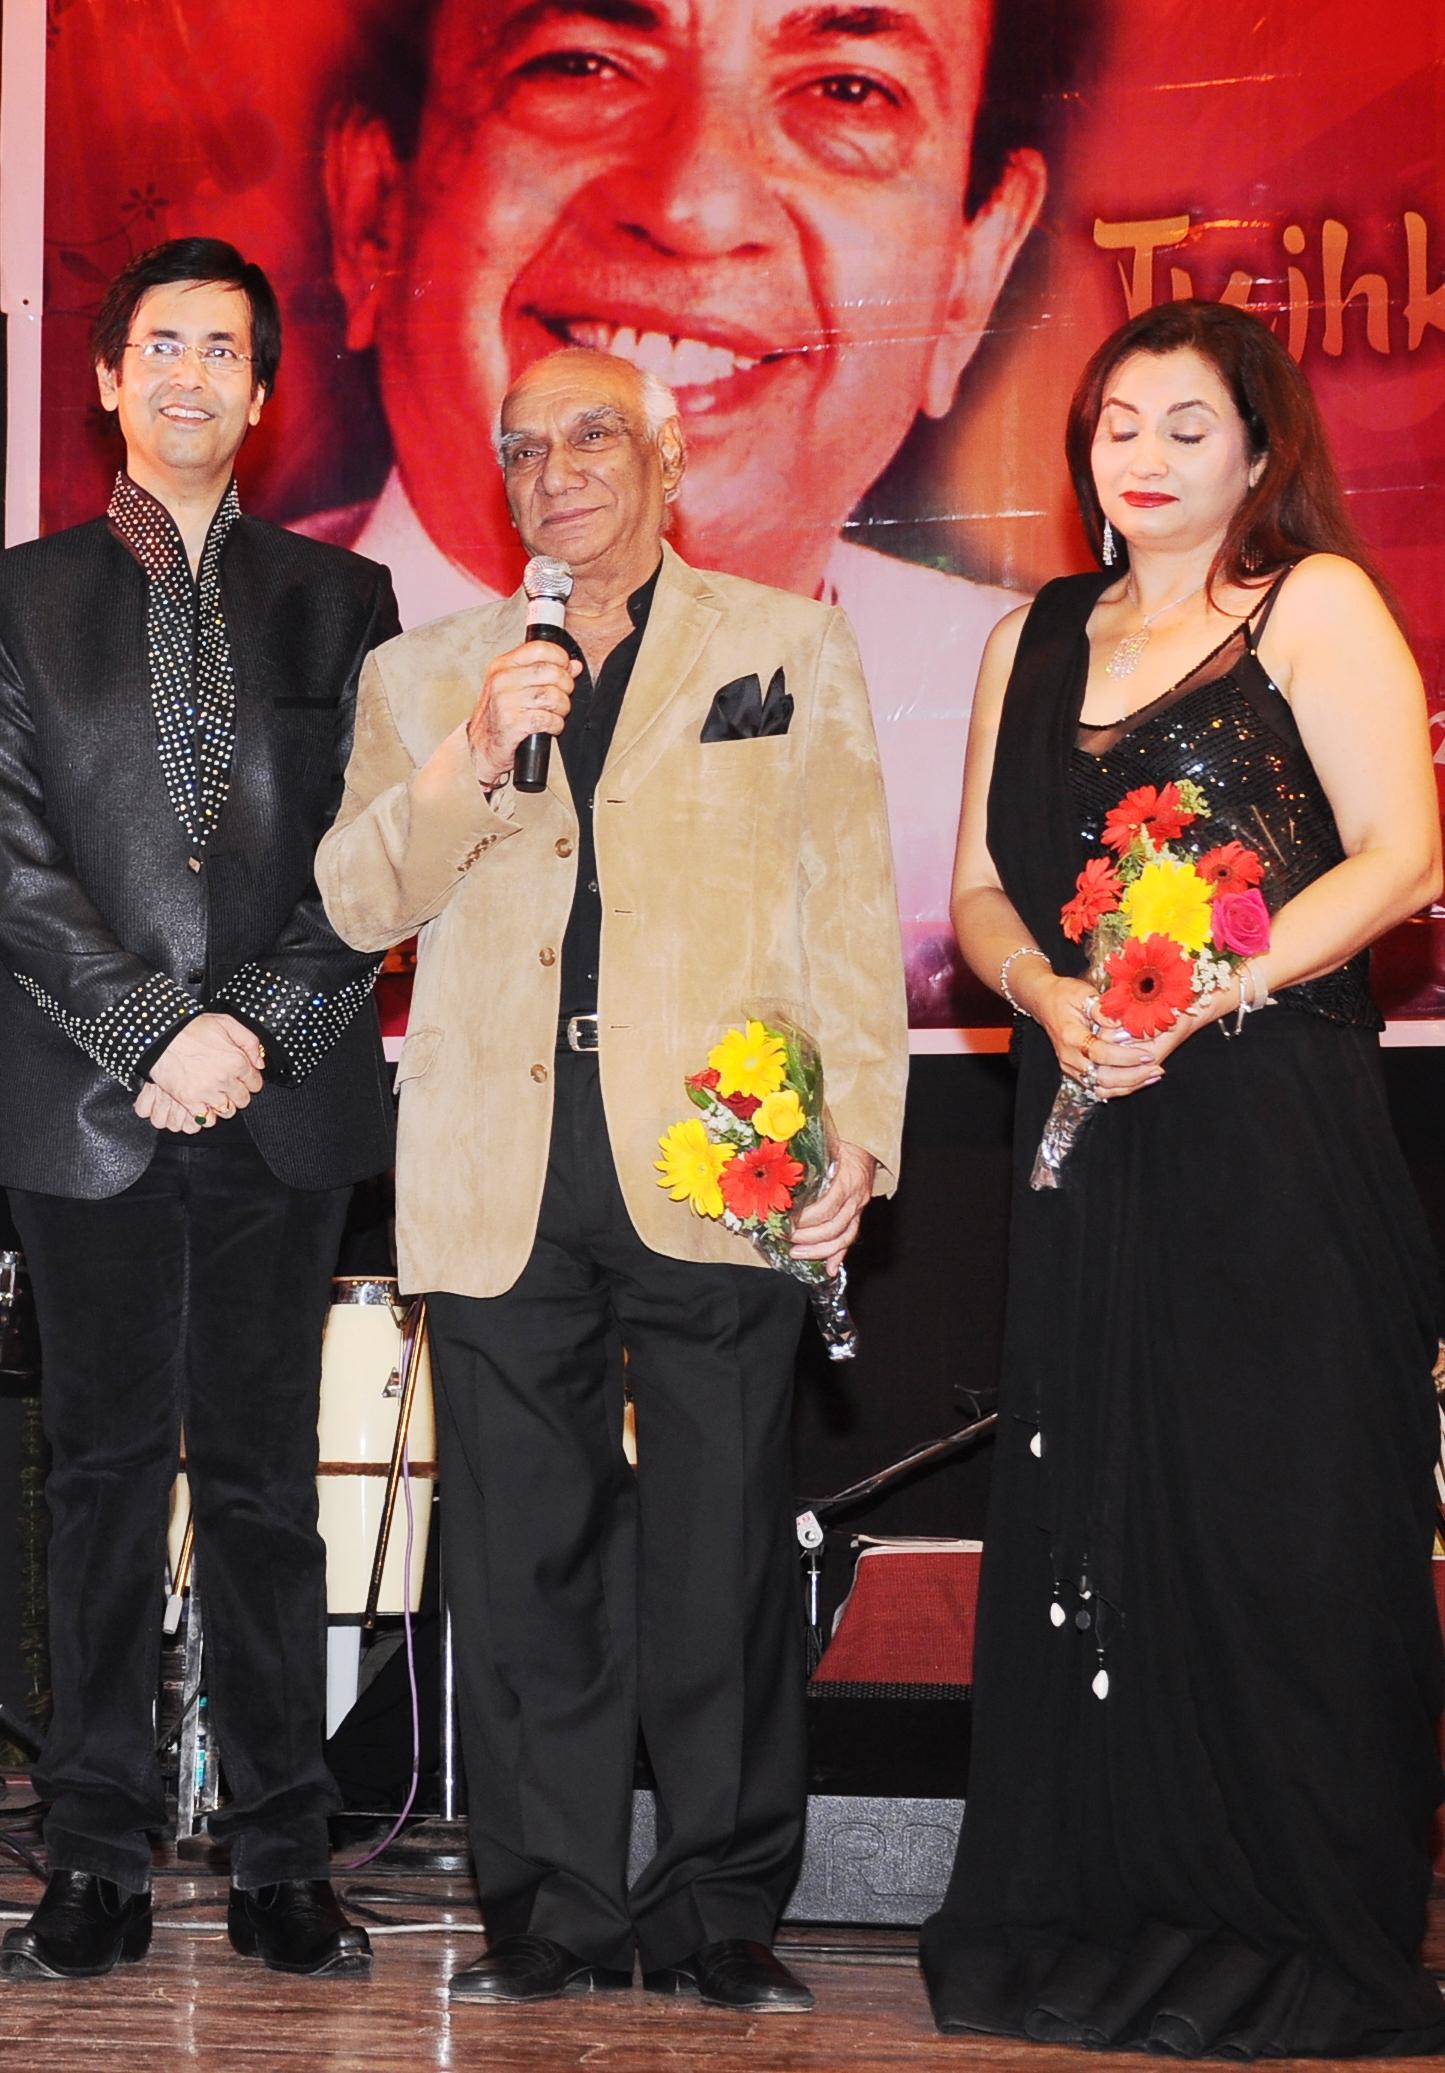 With Yash Chopra ji & Salma Agha ji